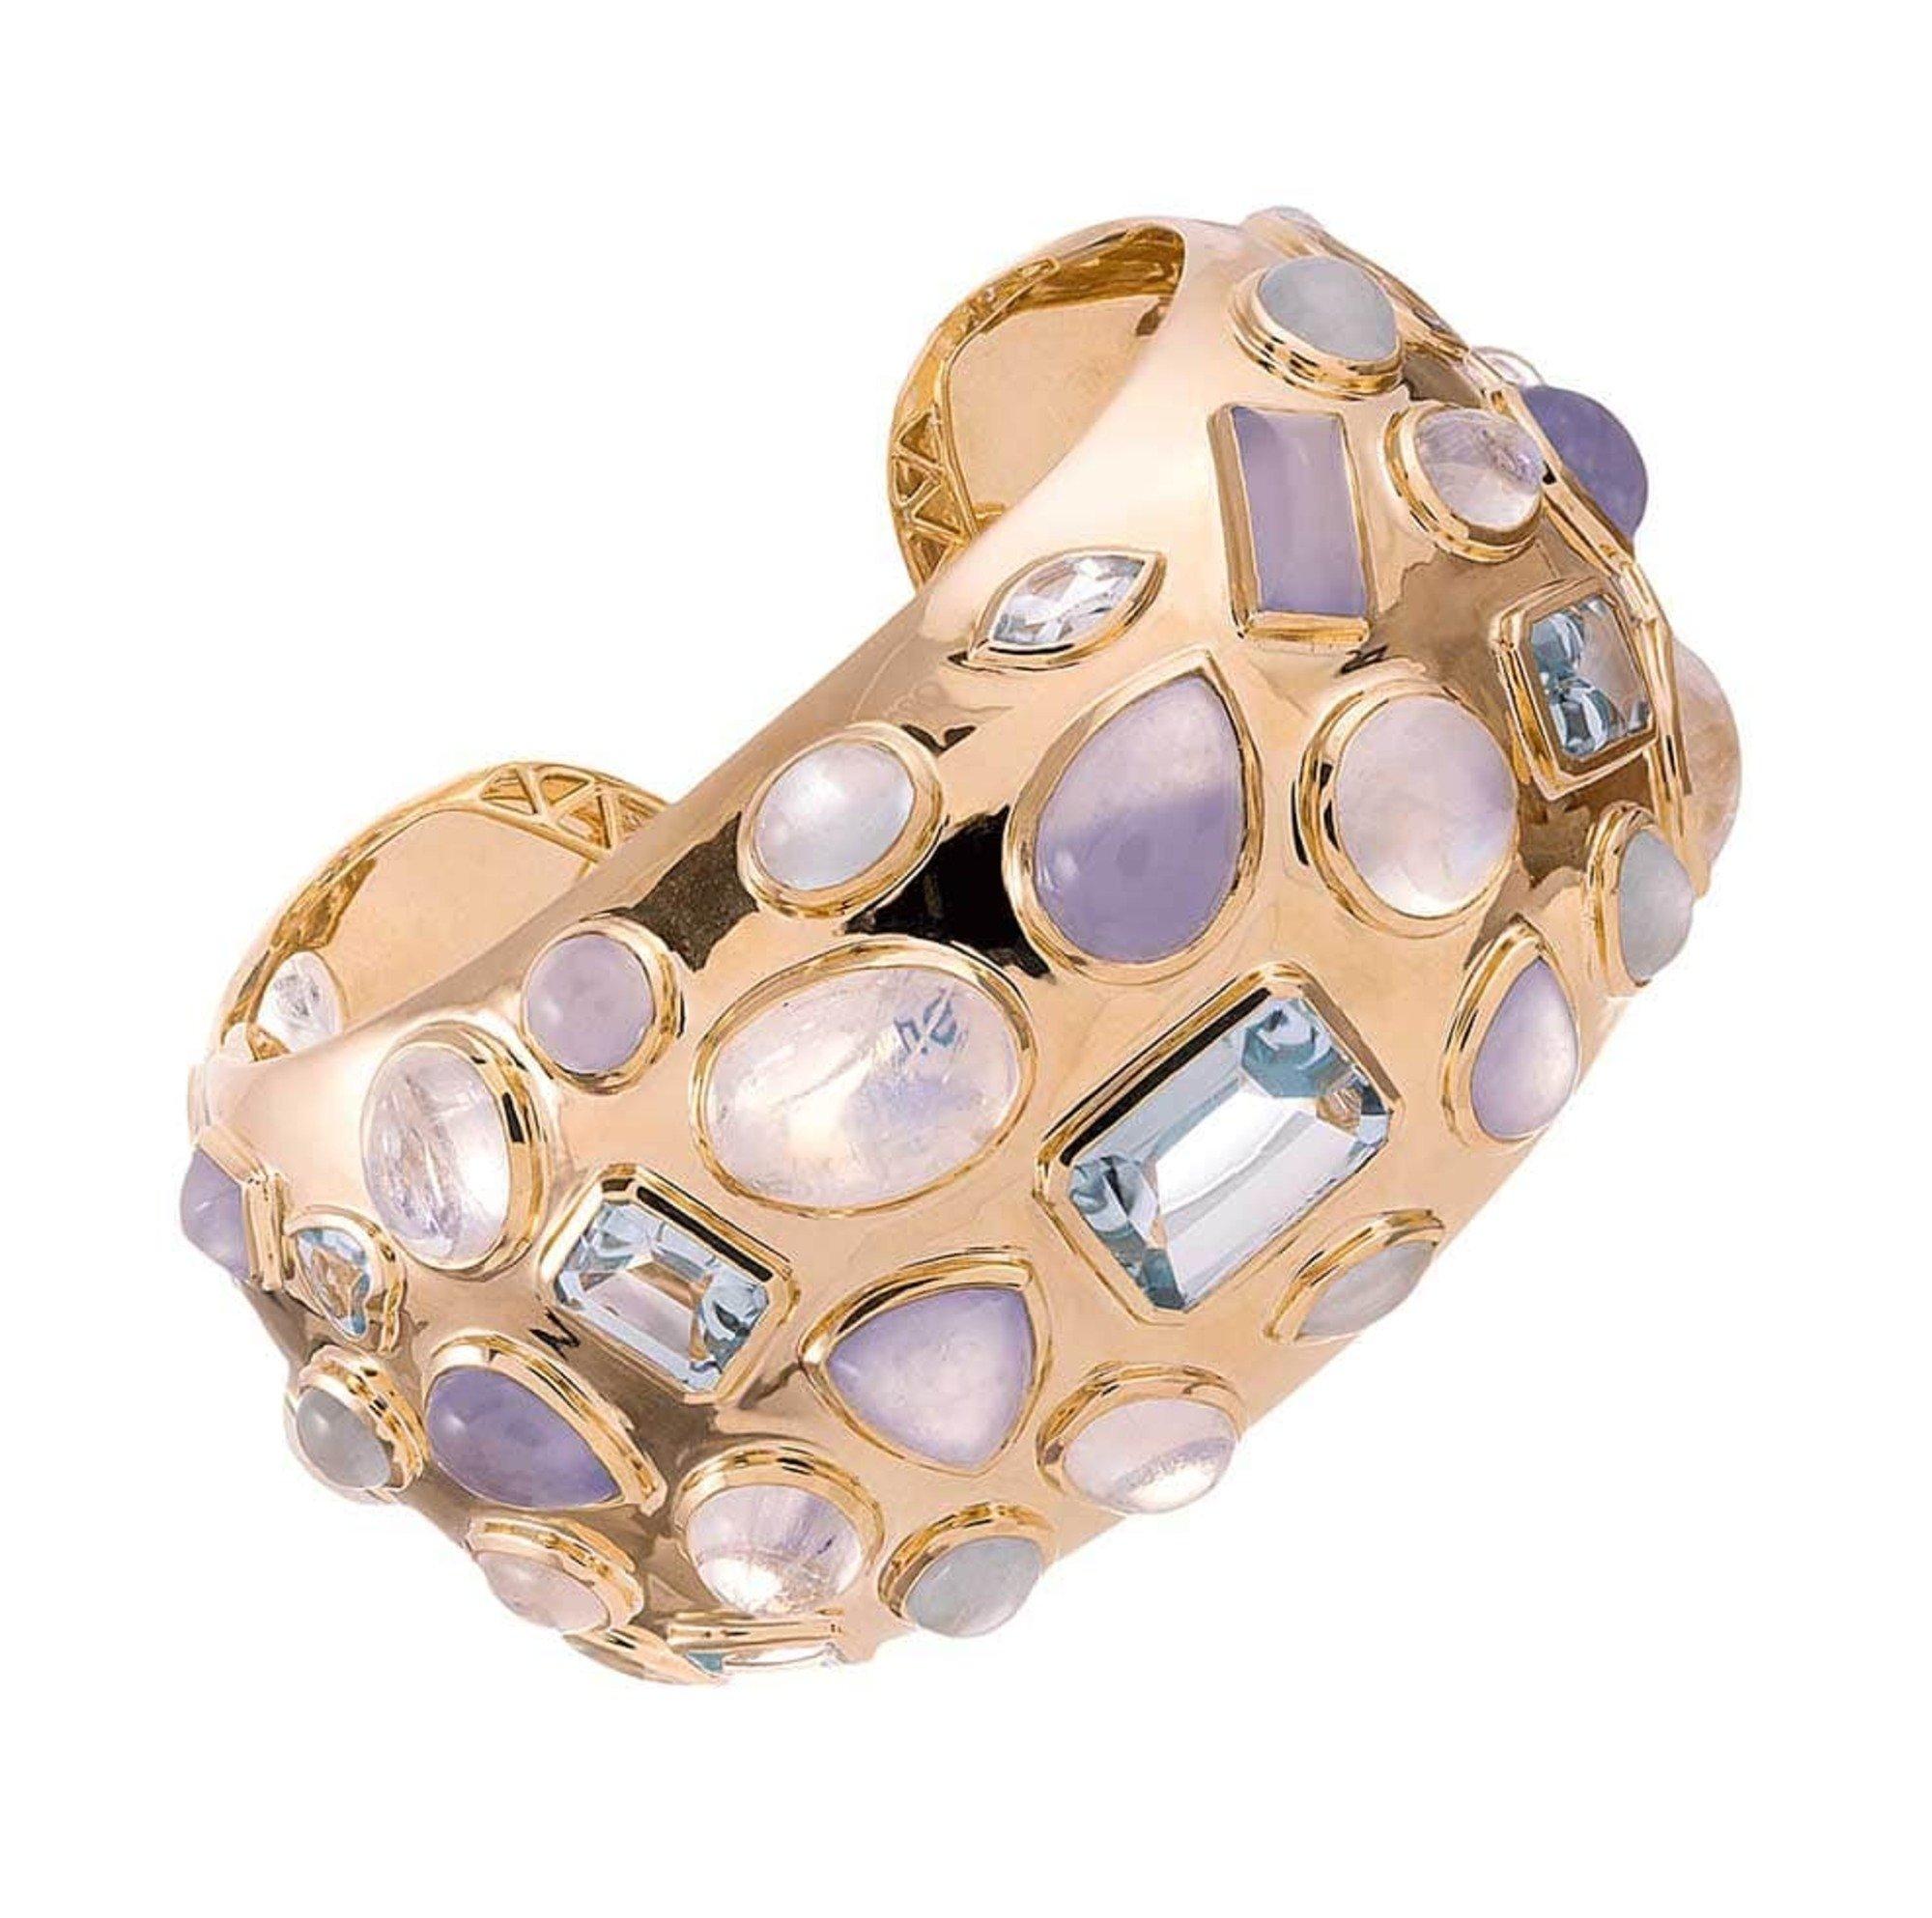 Americas Court Jeweler